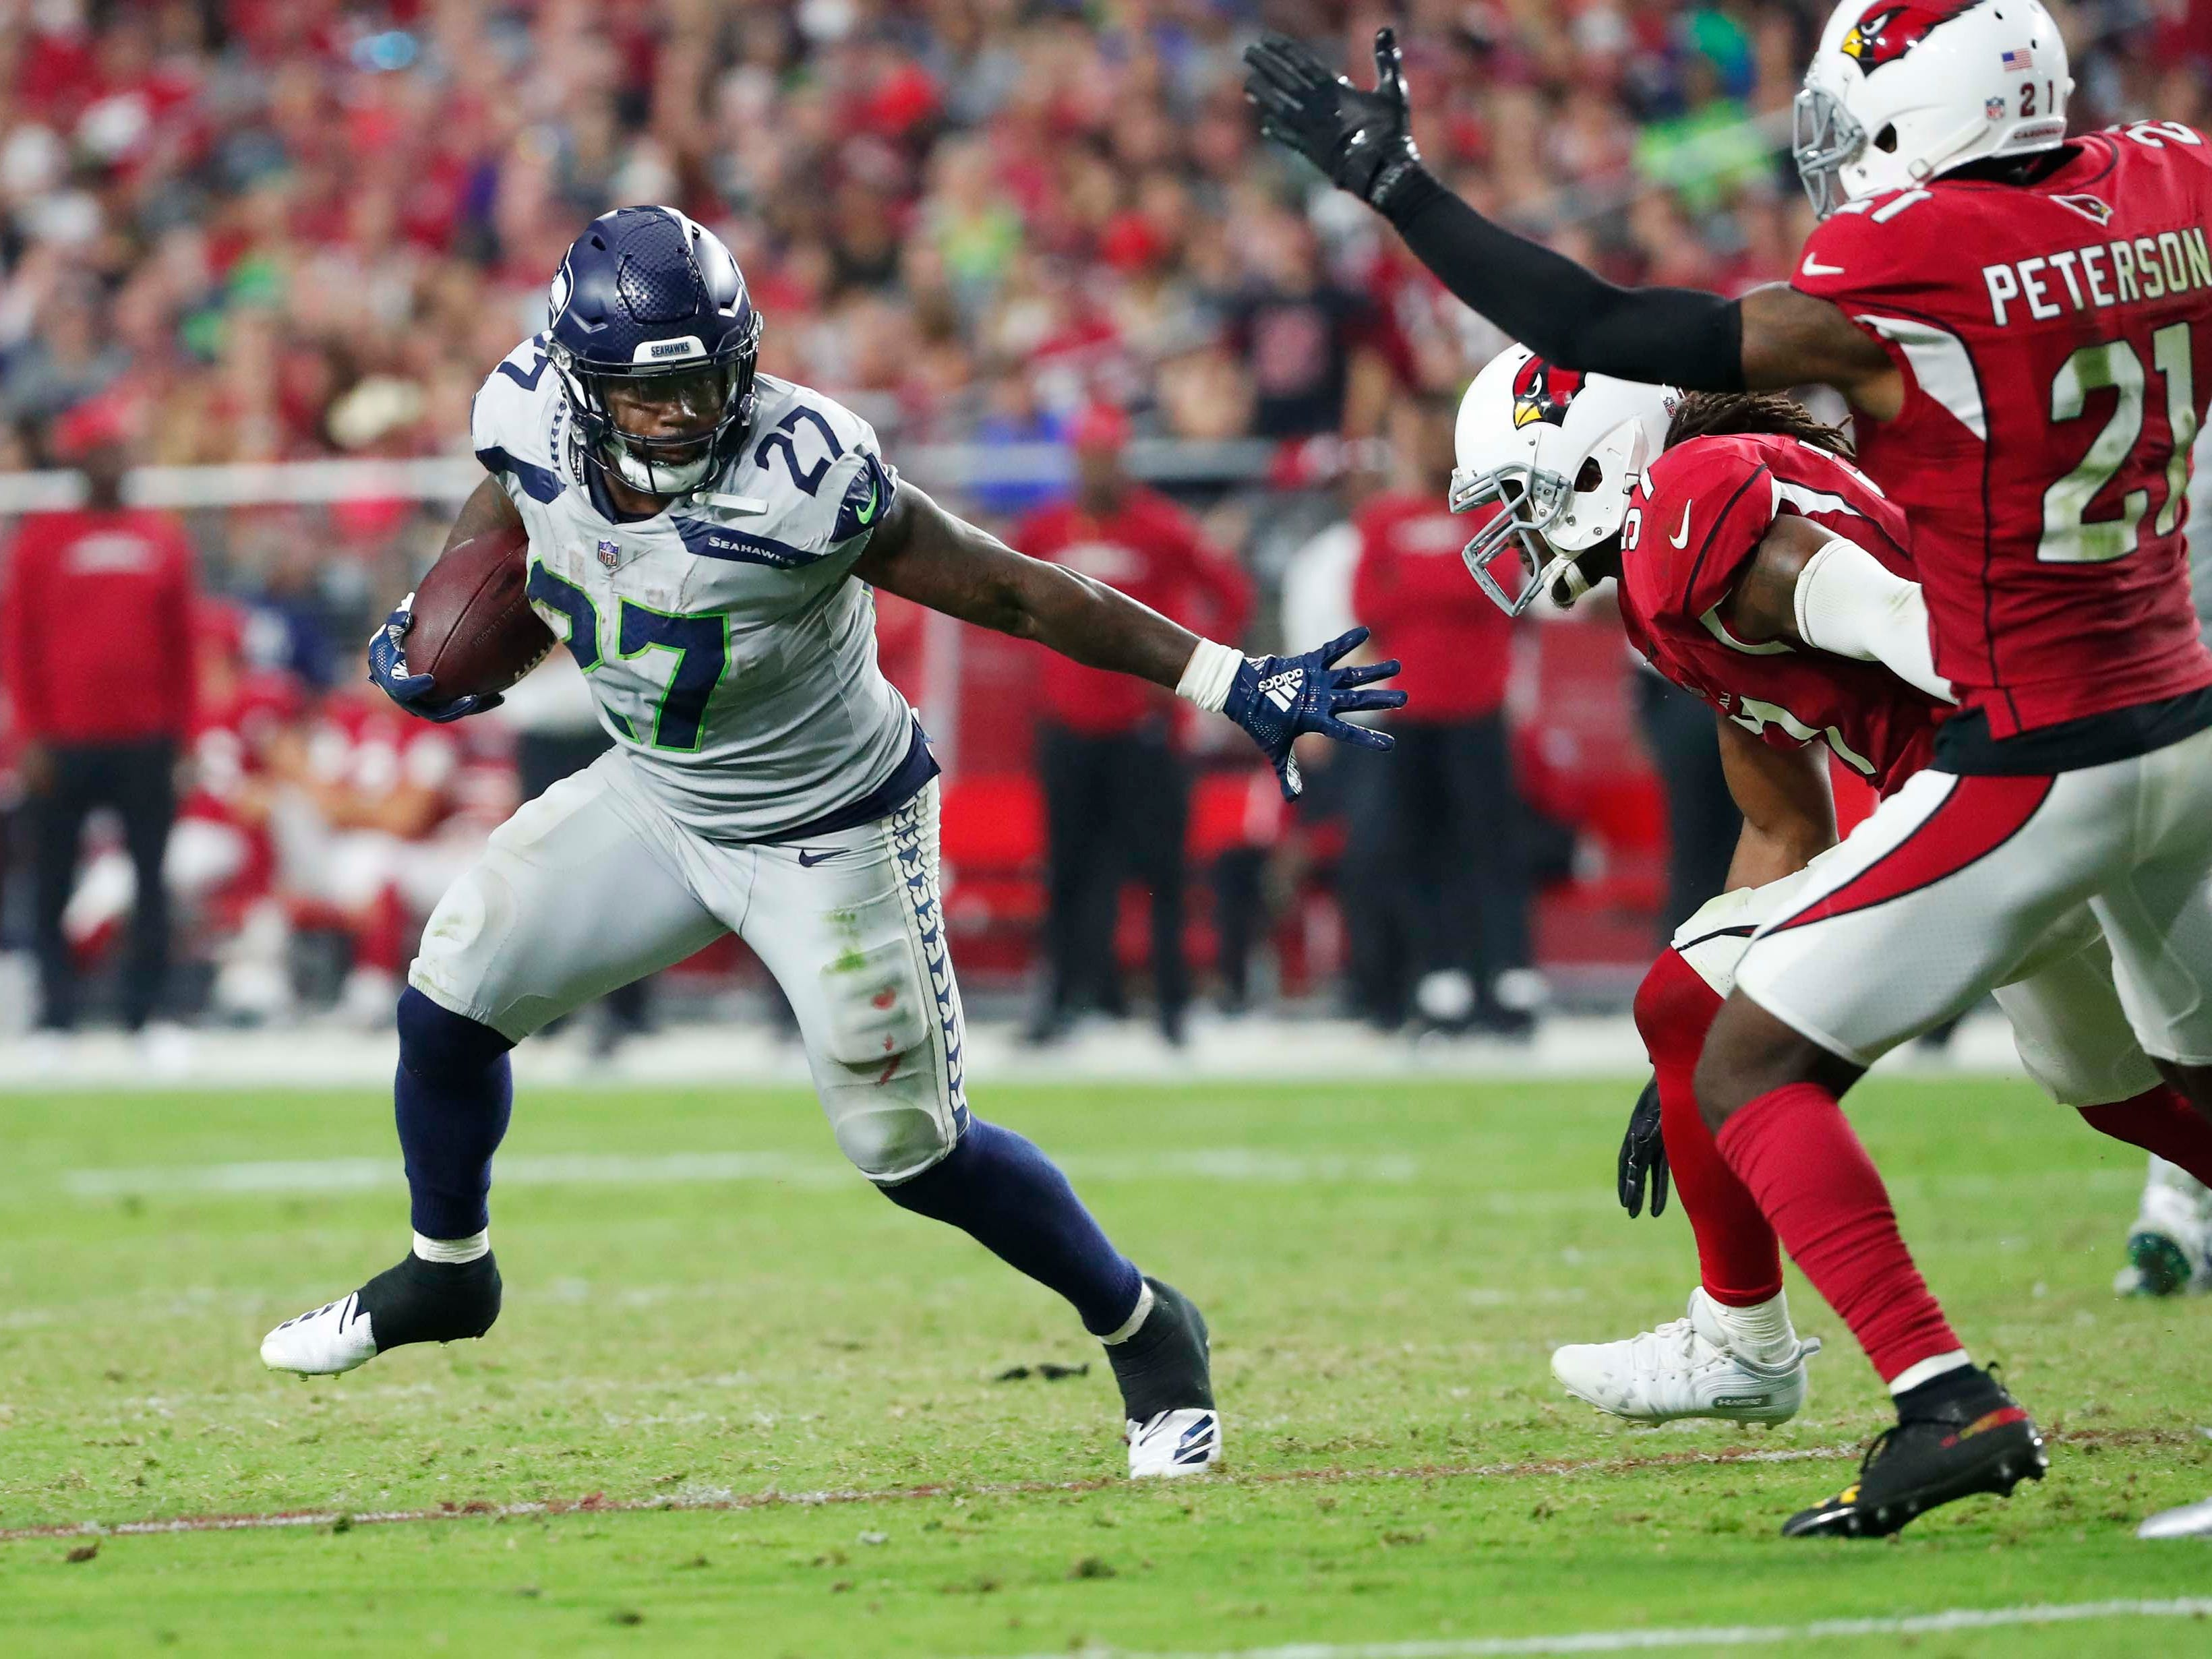 Seattle Seahawks running back Mike Davis (27) runs against Arizona Cardinals linebacker Josh Bynes (57) and defensive back Patrick Peterson (21) during the third quarter at State Farm Stadium in Glendale, Ariz. September 30, 2018.